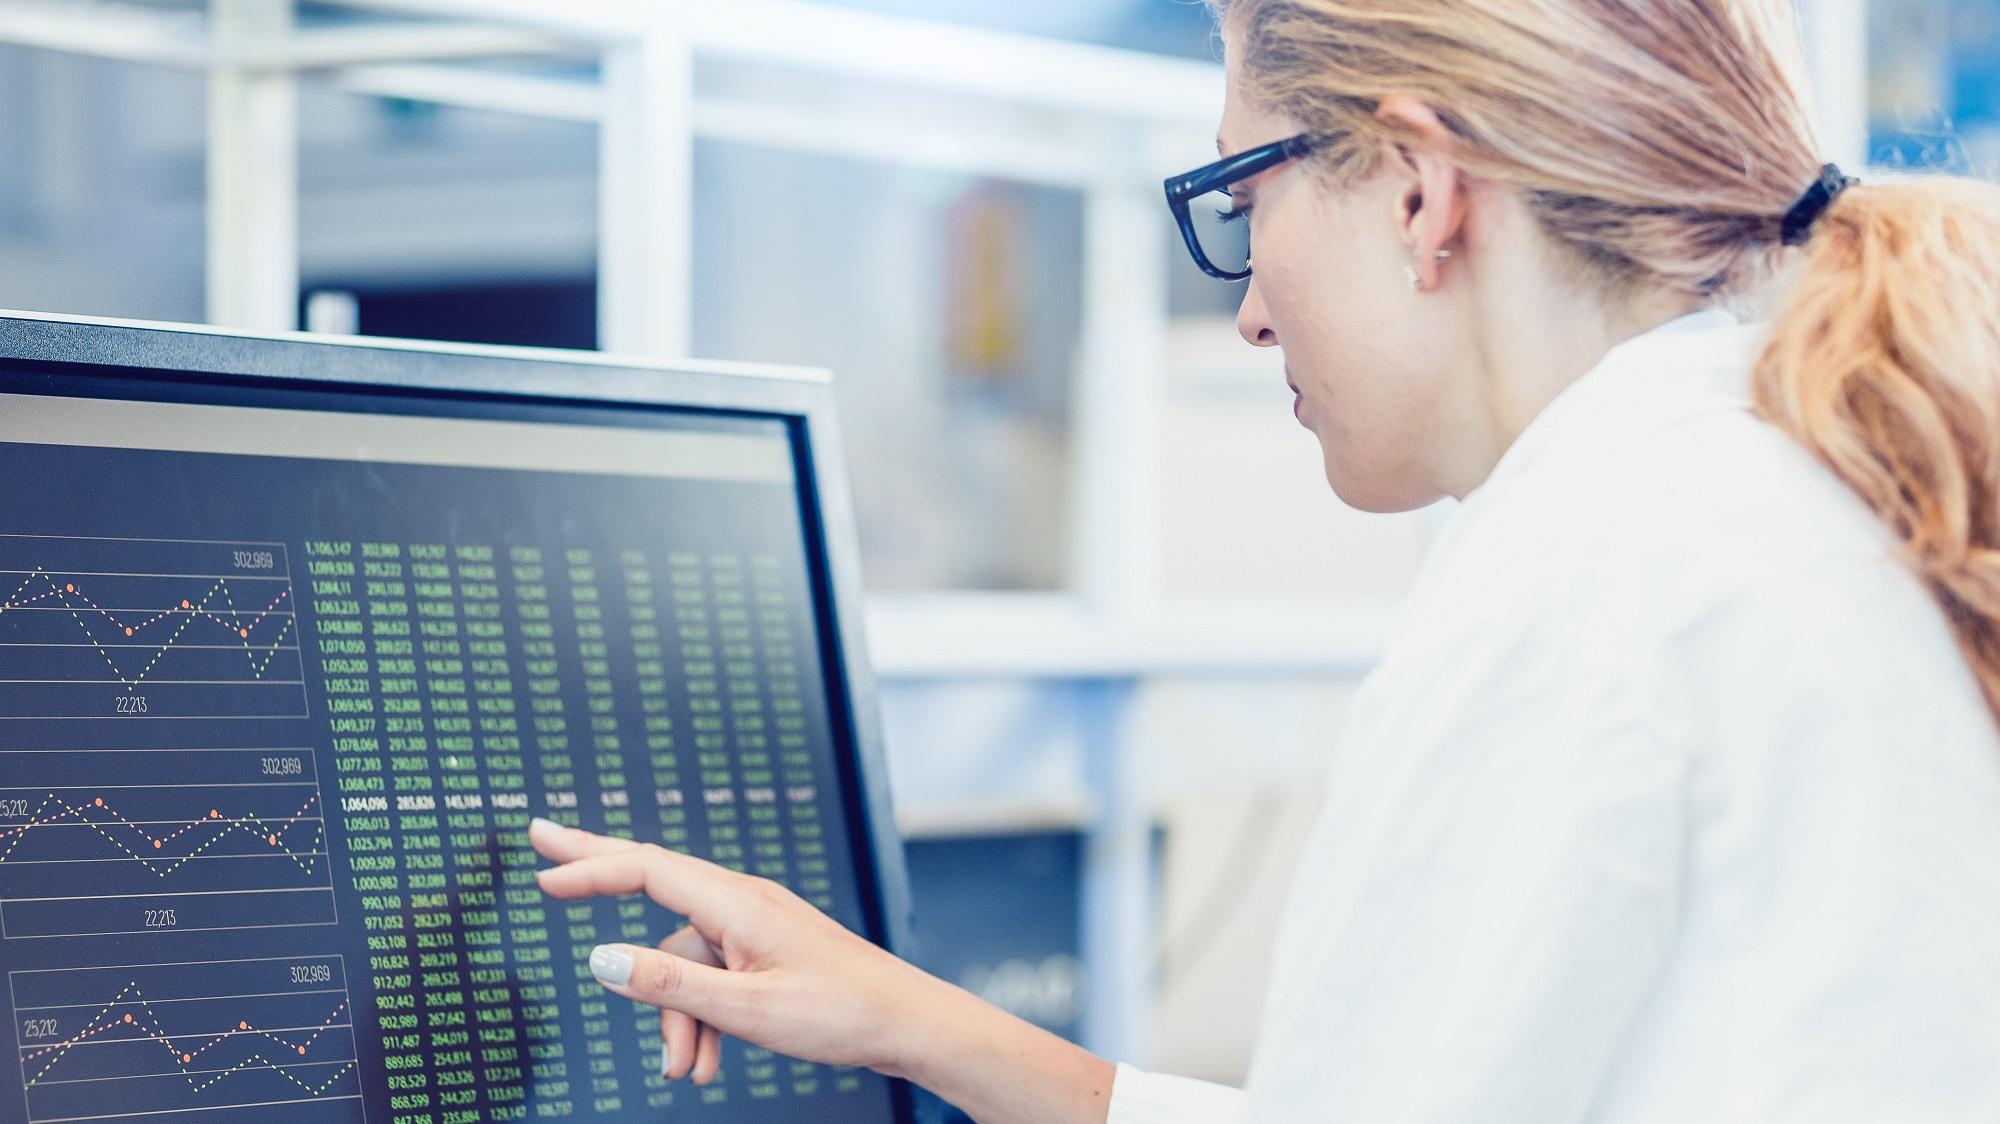 health care professional examining data